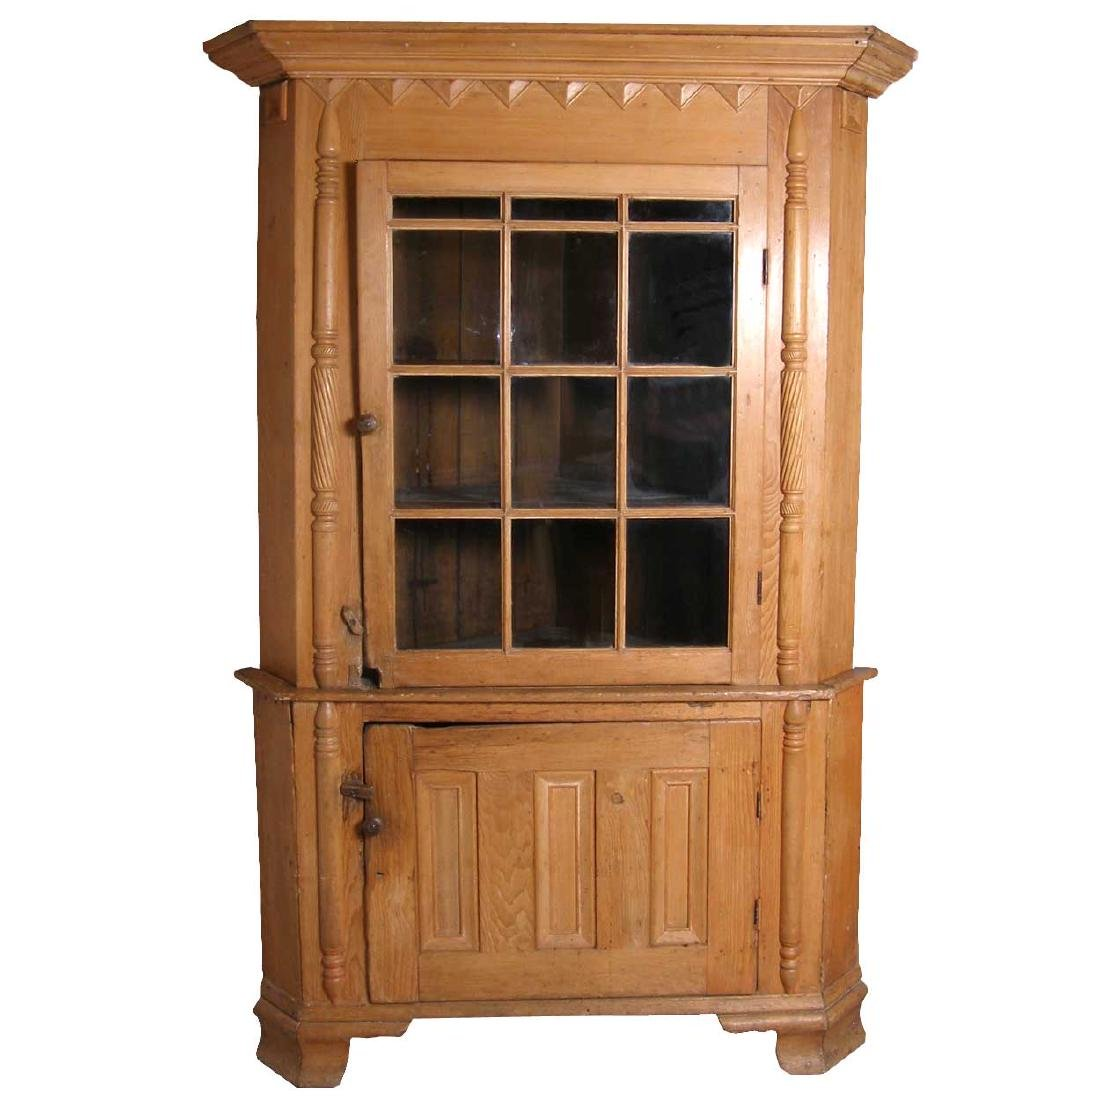 Important American Chippendale Pine Corner Cabinet